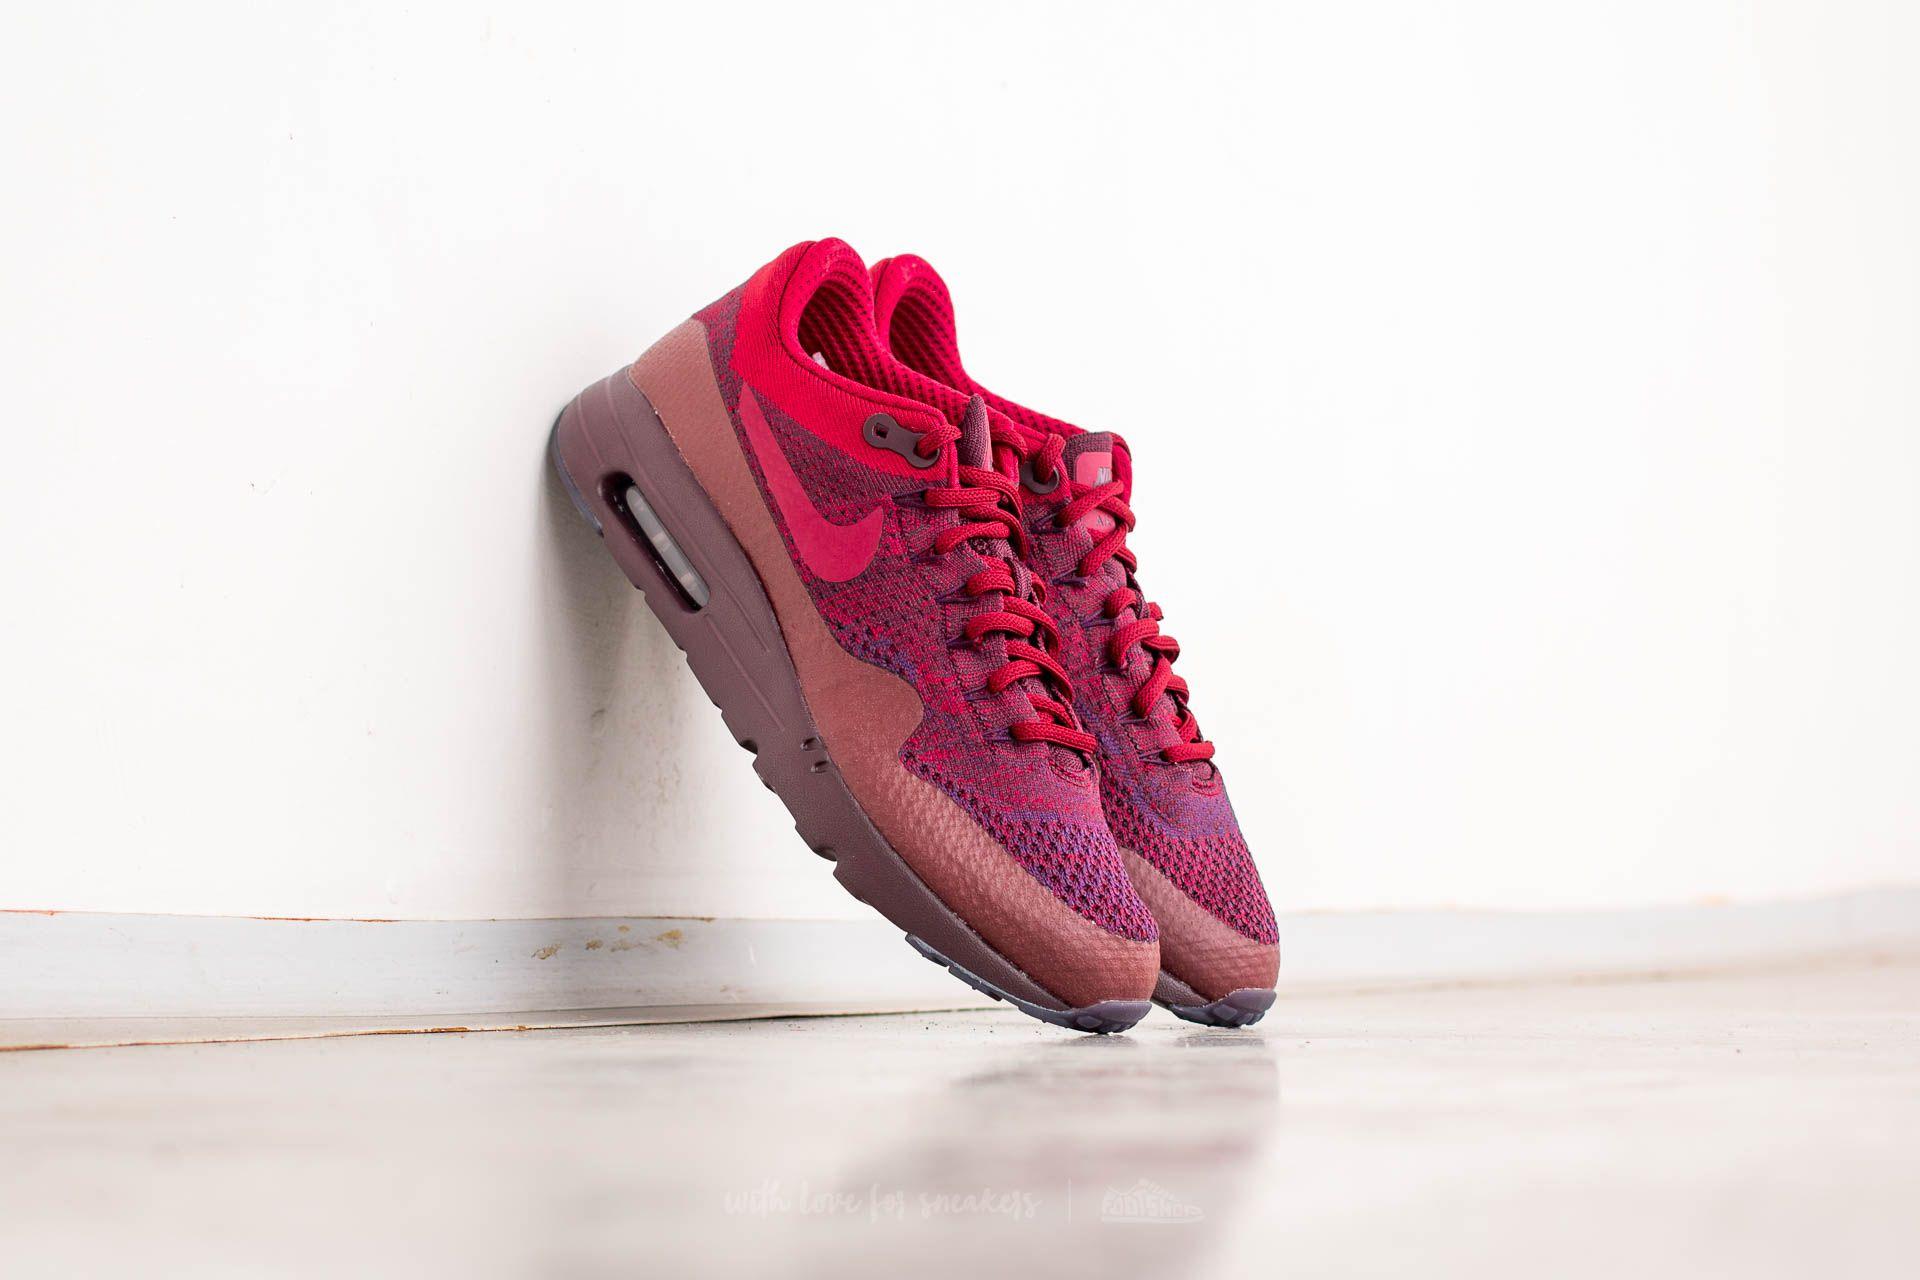 Nike Air Max 1 Ultra Flyknit Grand Purple/ Team Red